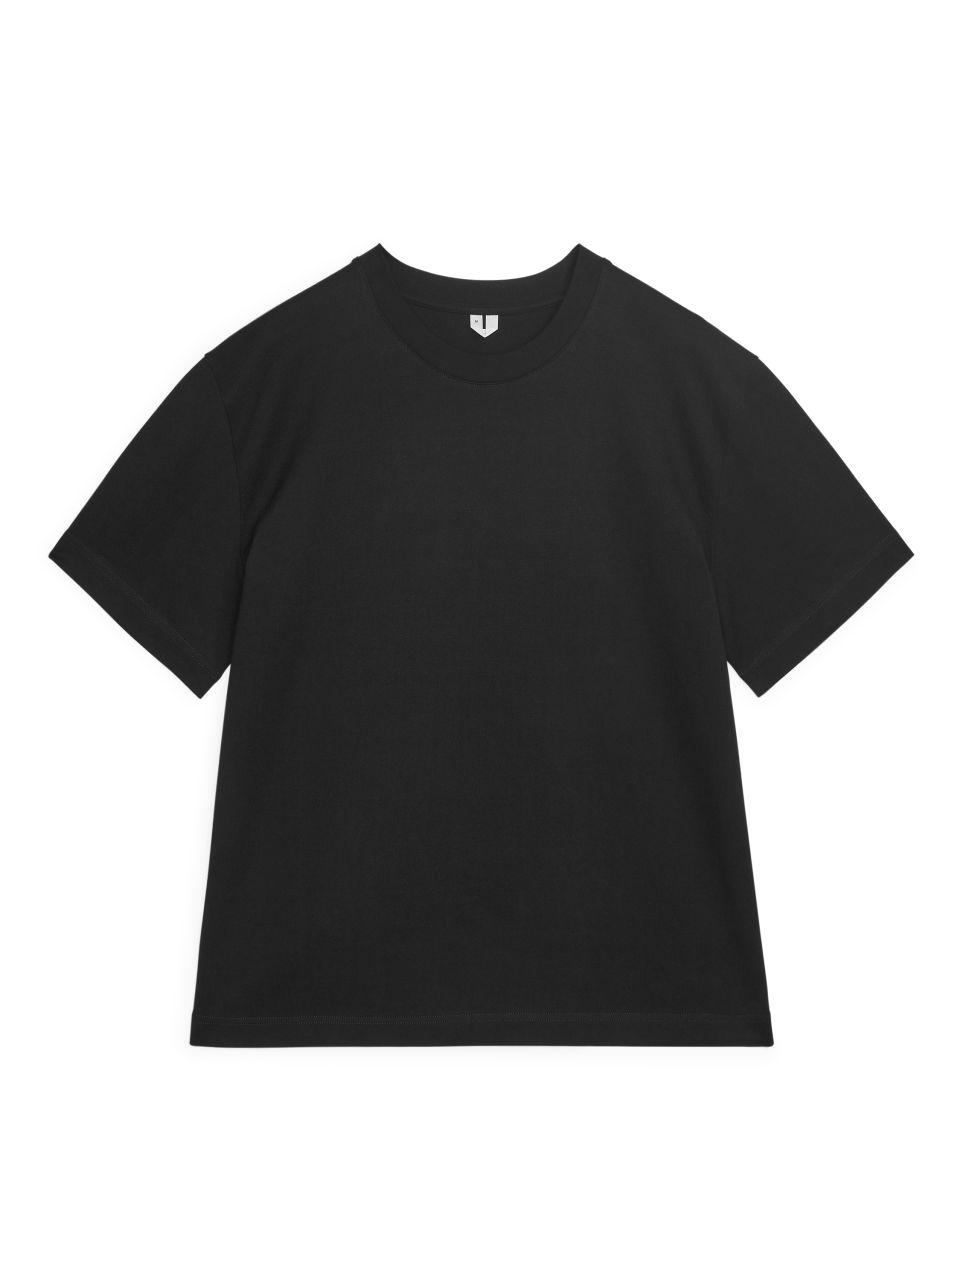 Oversized Heavyweight T-shirt - Black